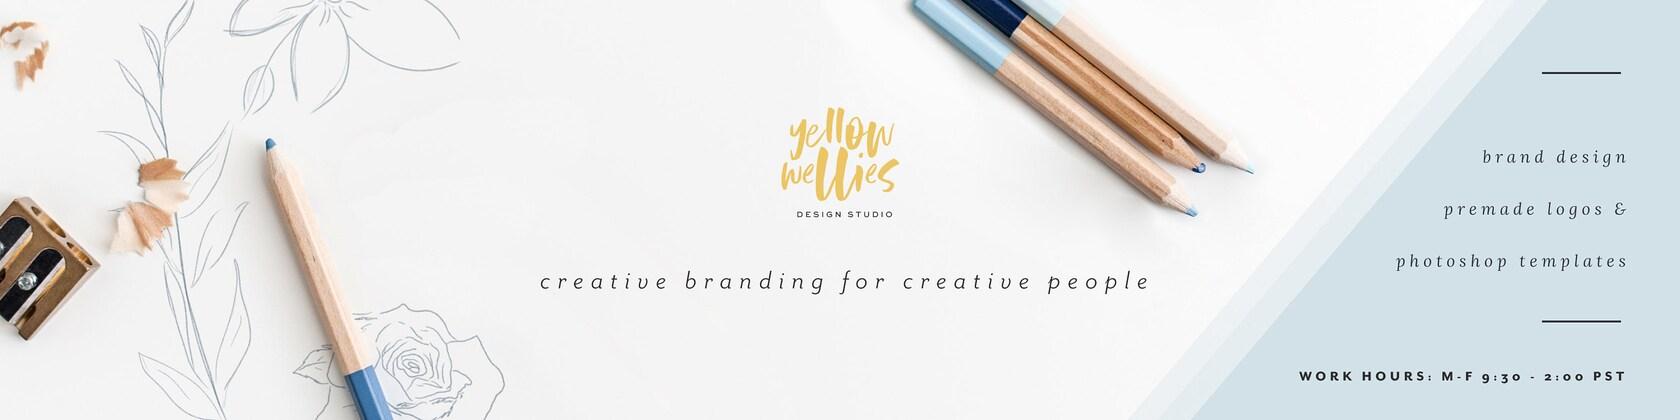 Logo Design Branding Photoshop Templates Par YellowWelliesDesigns